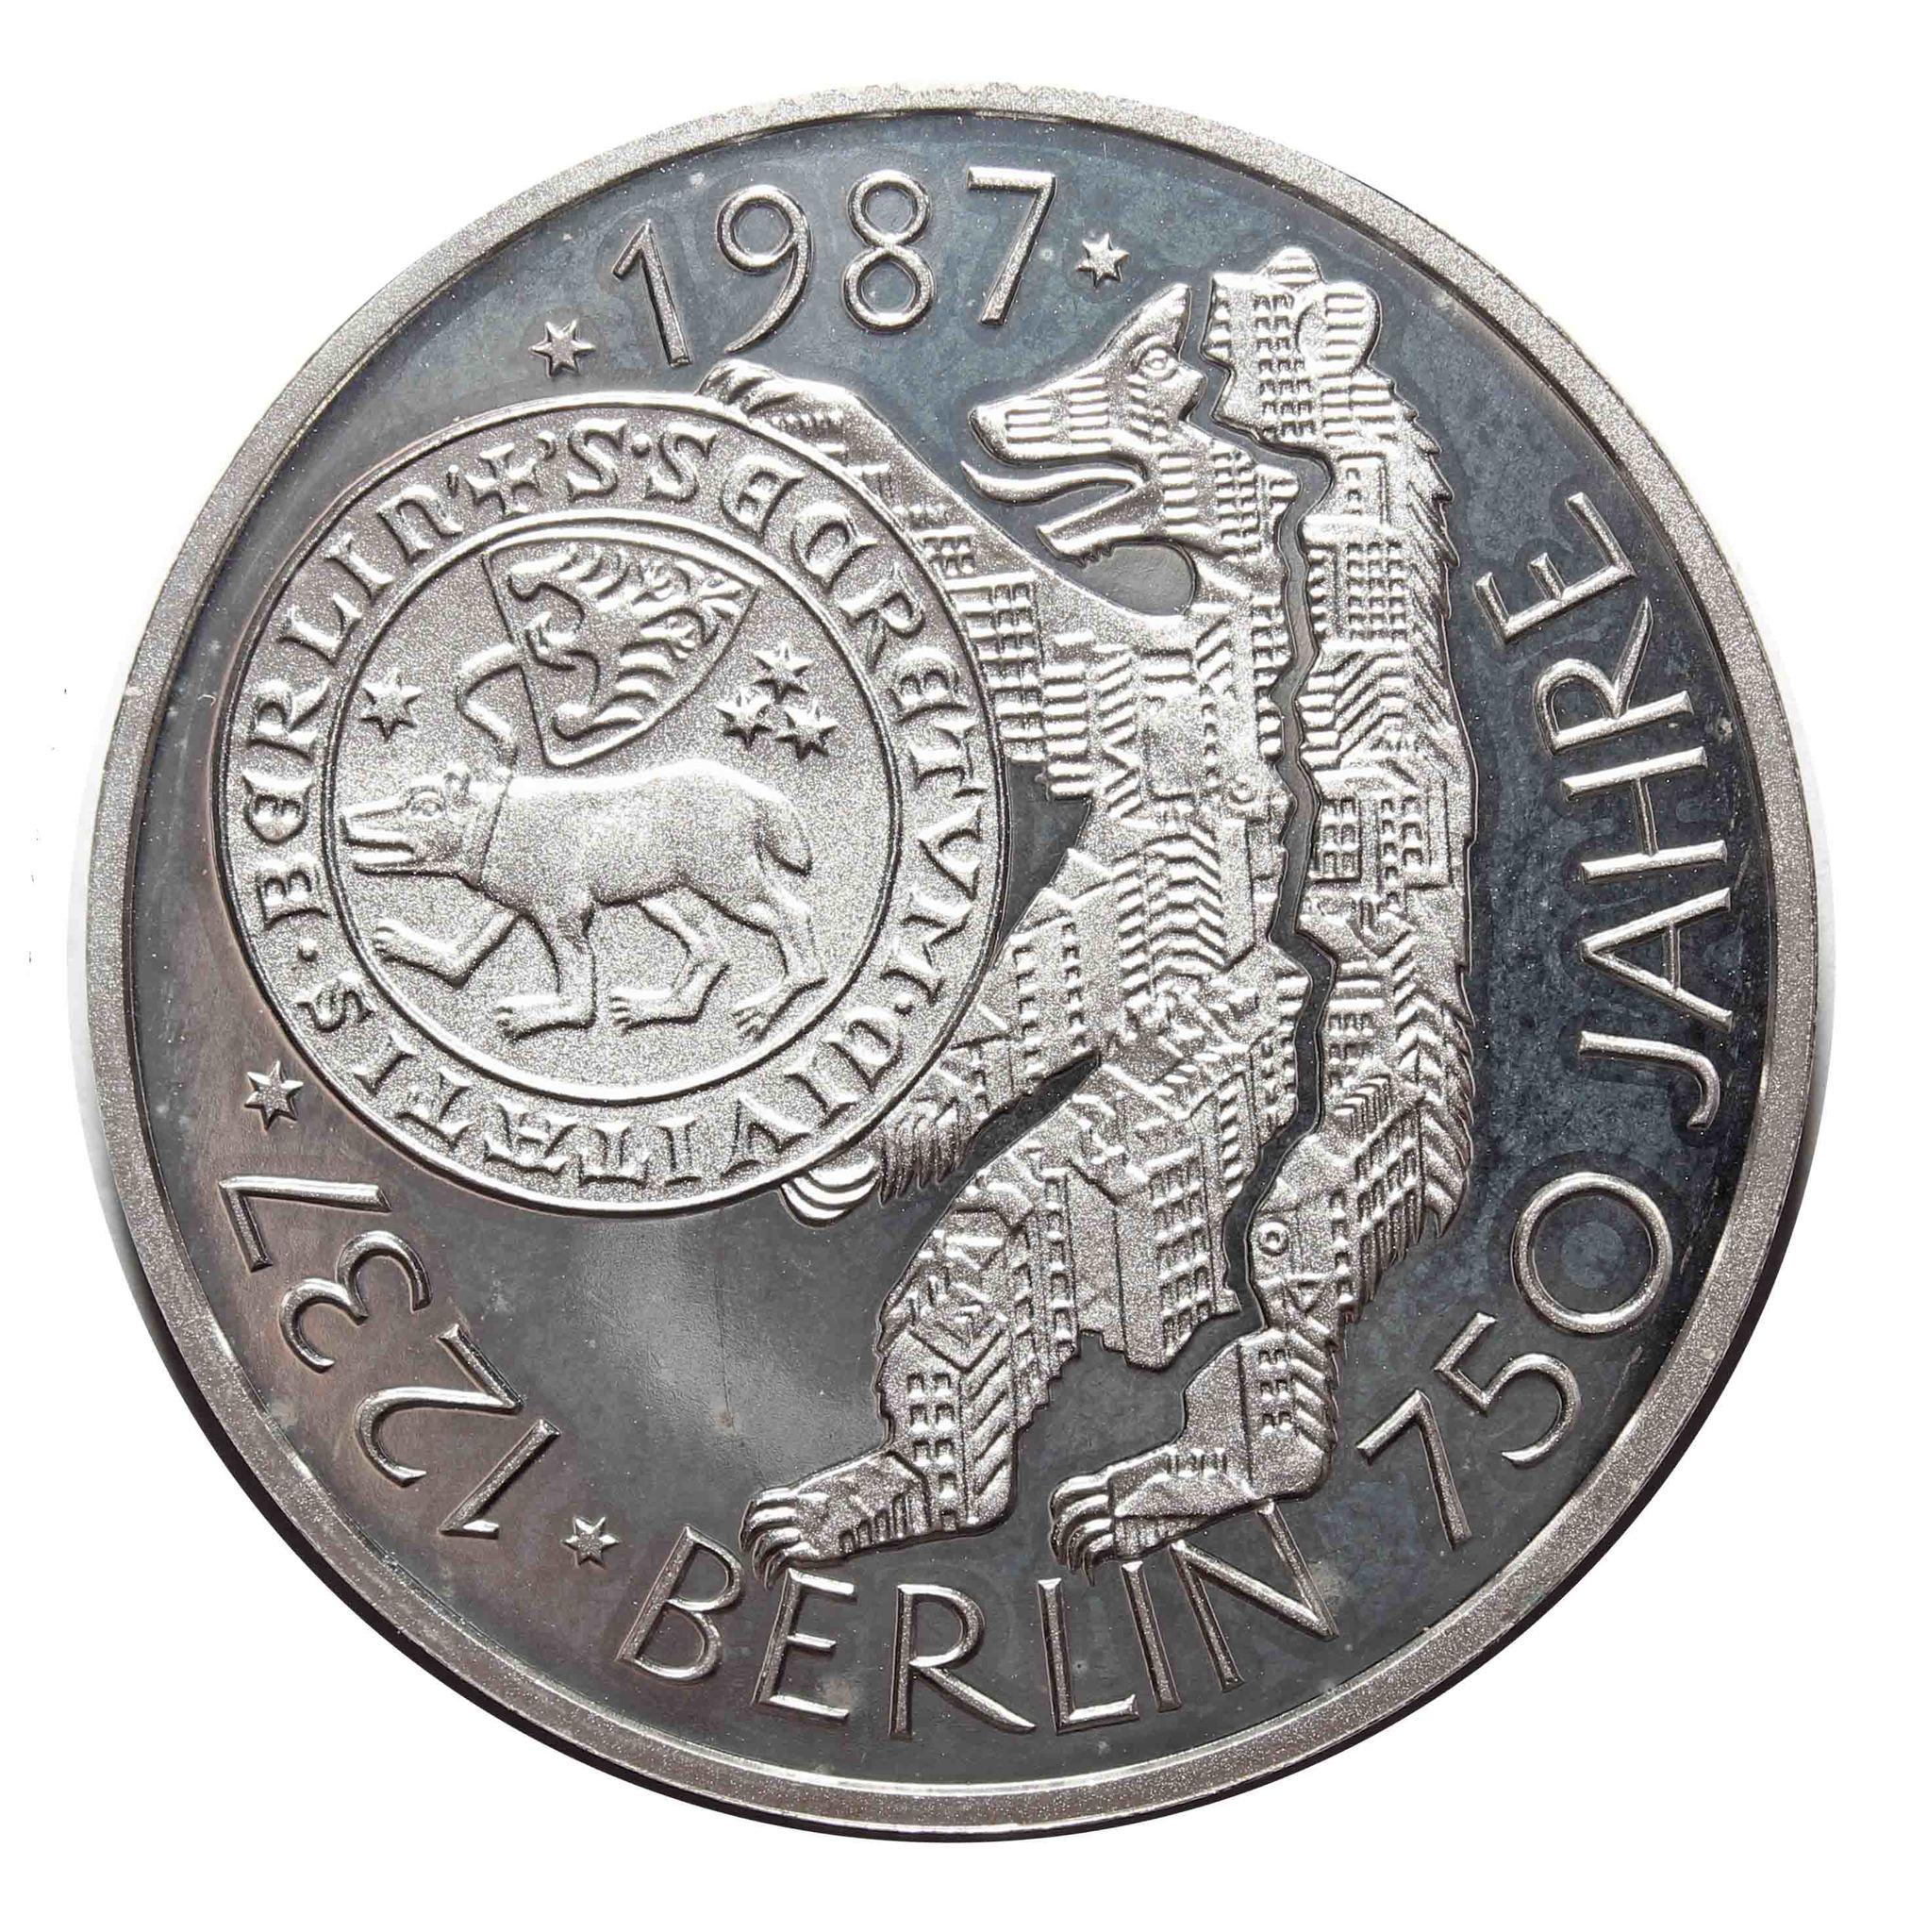 10 марок 1987 год (J) 750 лет городу Берлин, Германия. Серебро. exPROOF